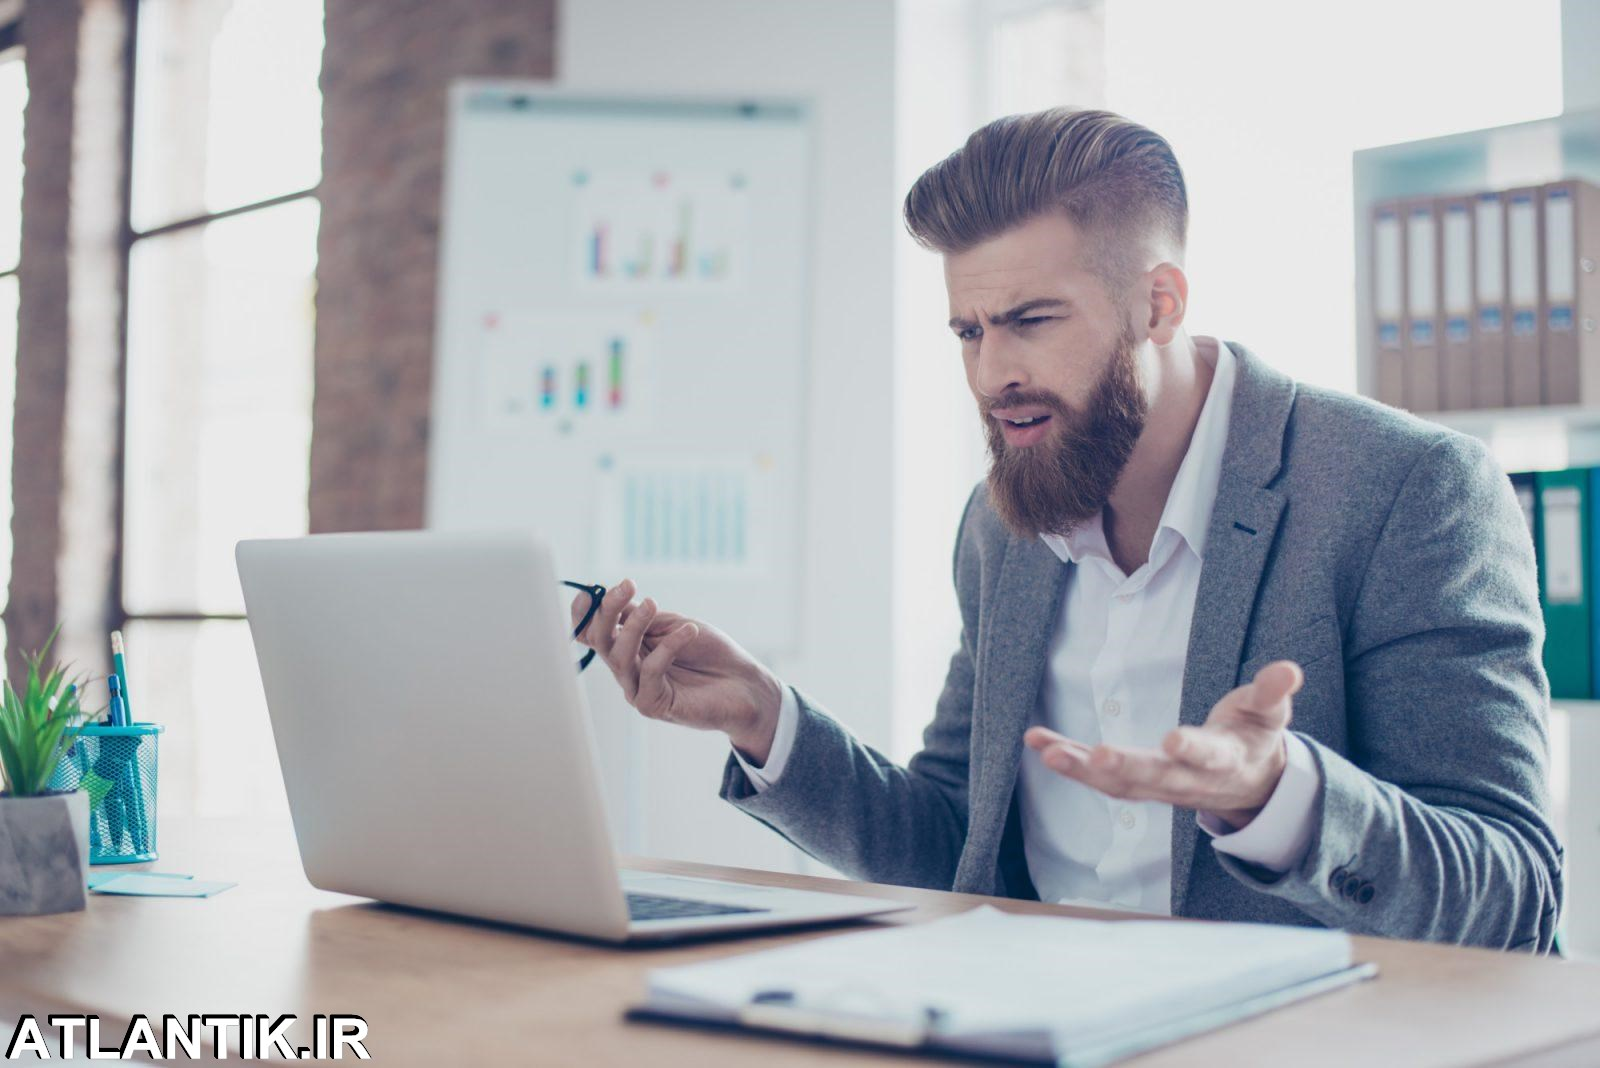 Cause of computer slowdown - علت های کند شدن کامپیوتر چیست و راه حل آن چه می باشد؟